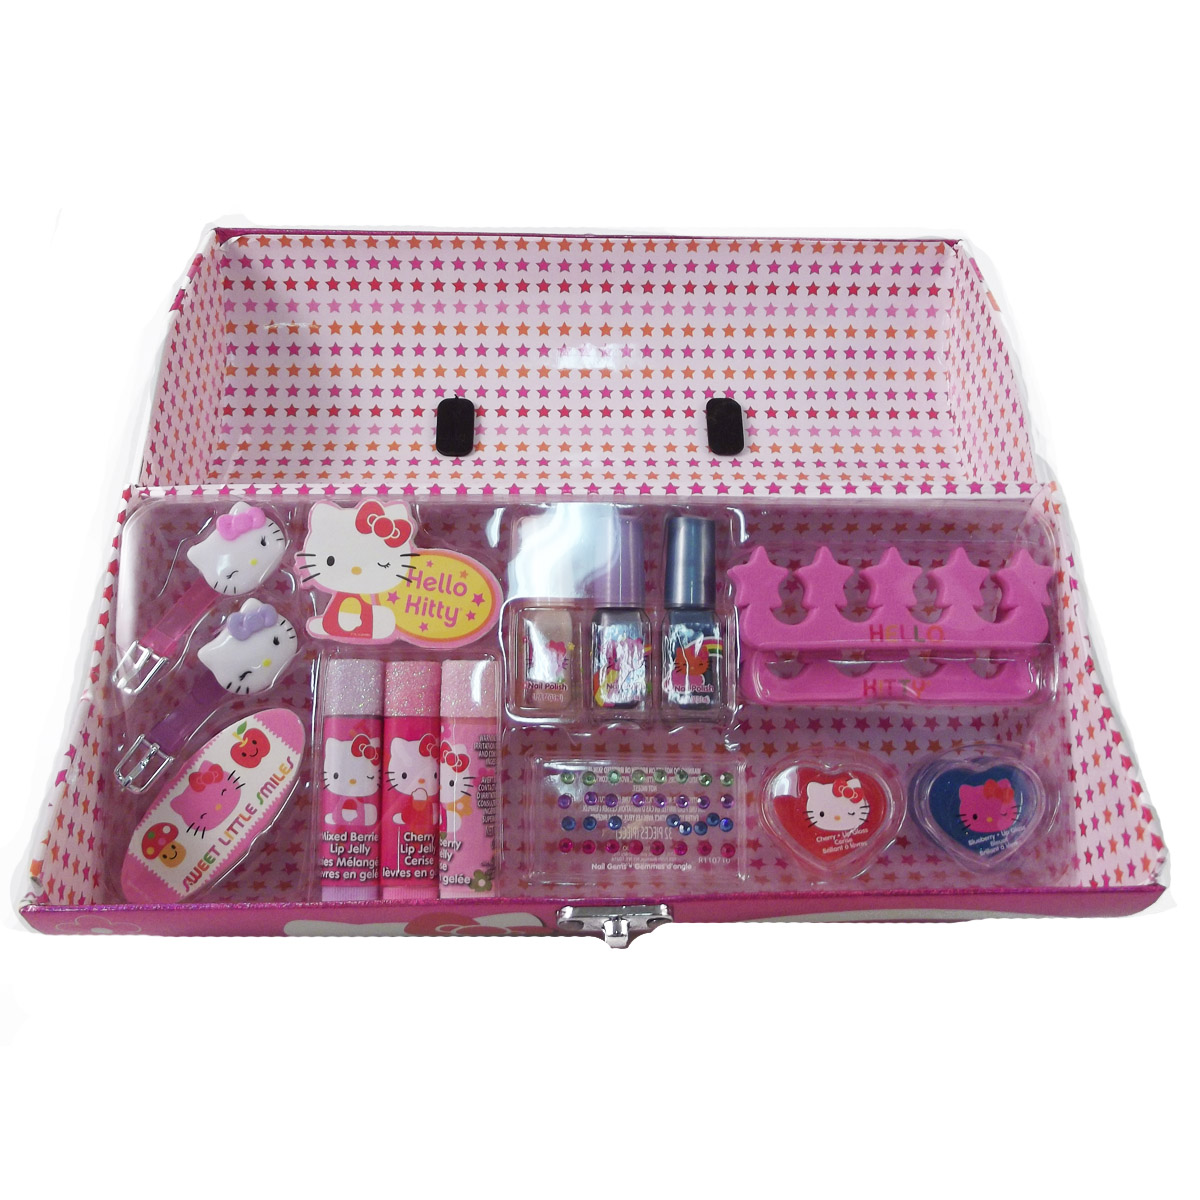 hello kitty makeup kit. makeup ideas hello kitty : alfa img - showing u0026gt; set kit